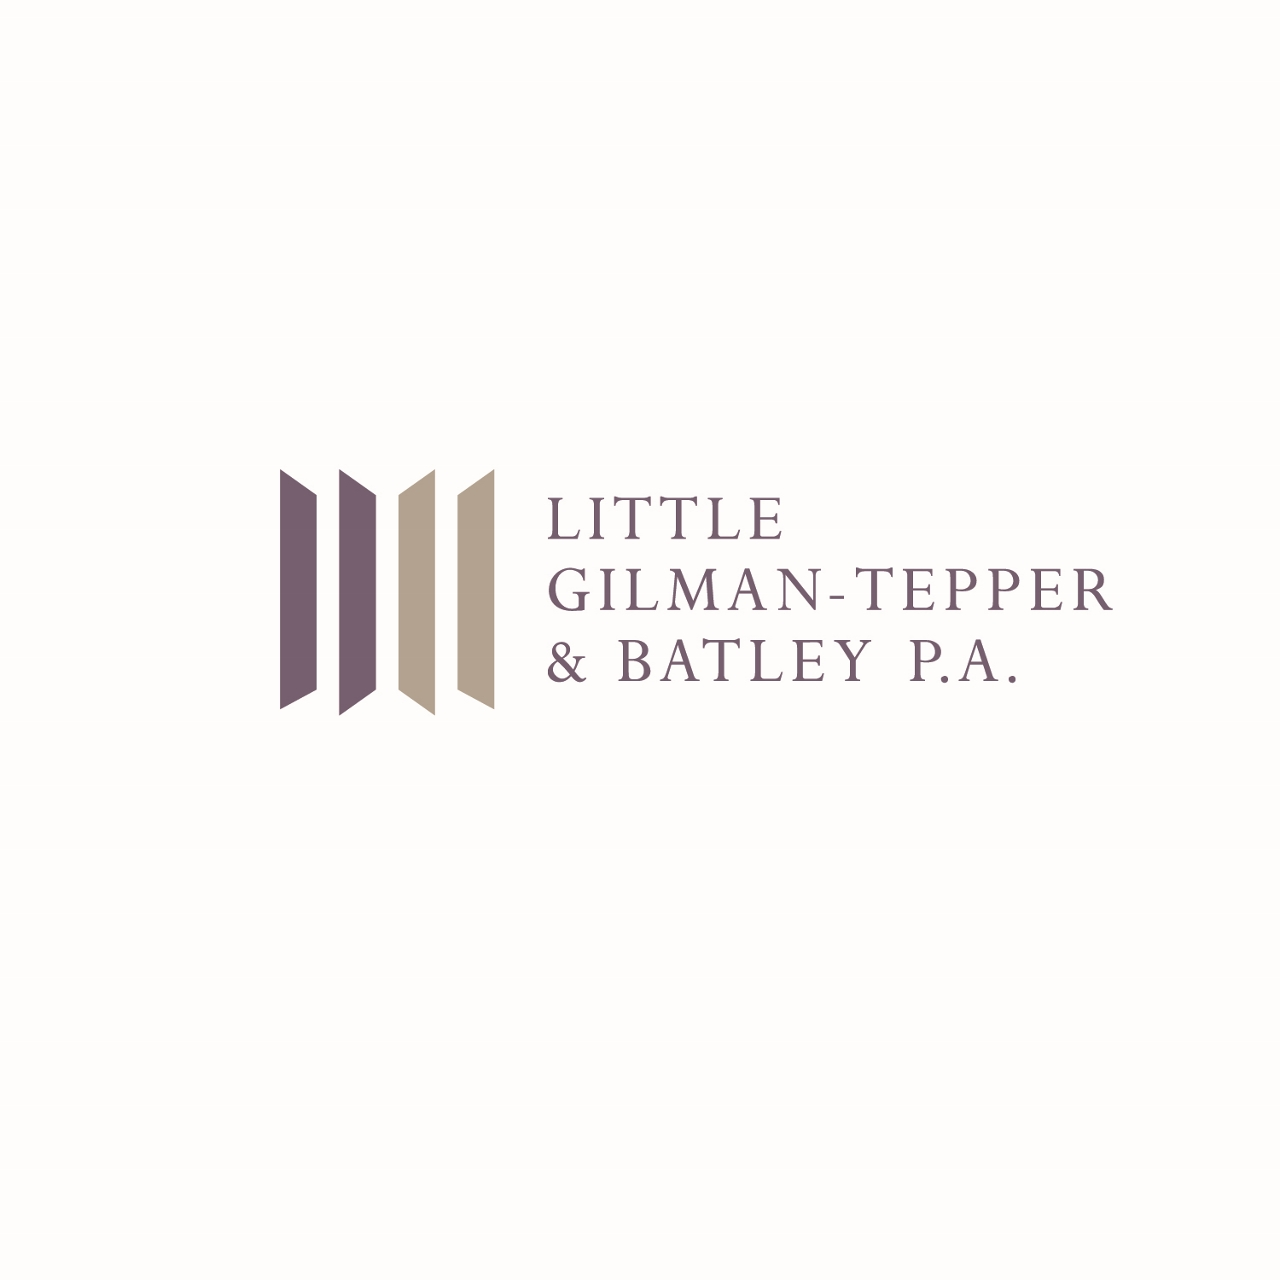 Little, Gilman-Tepper & Batley, P.A.